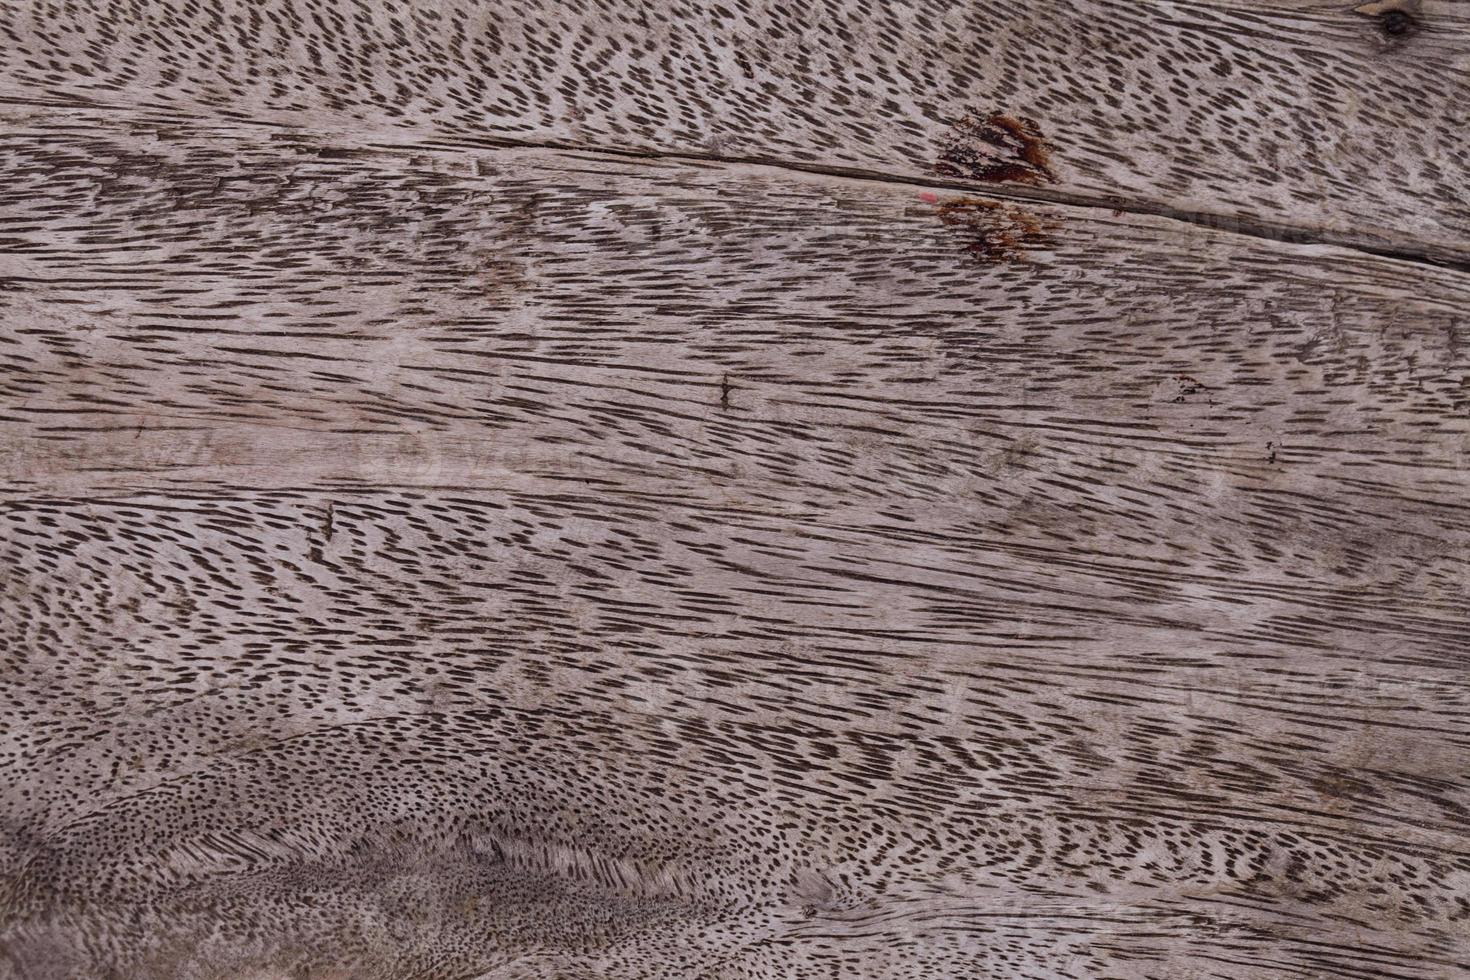 struttura di legno. foto